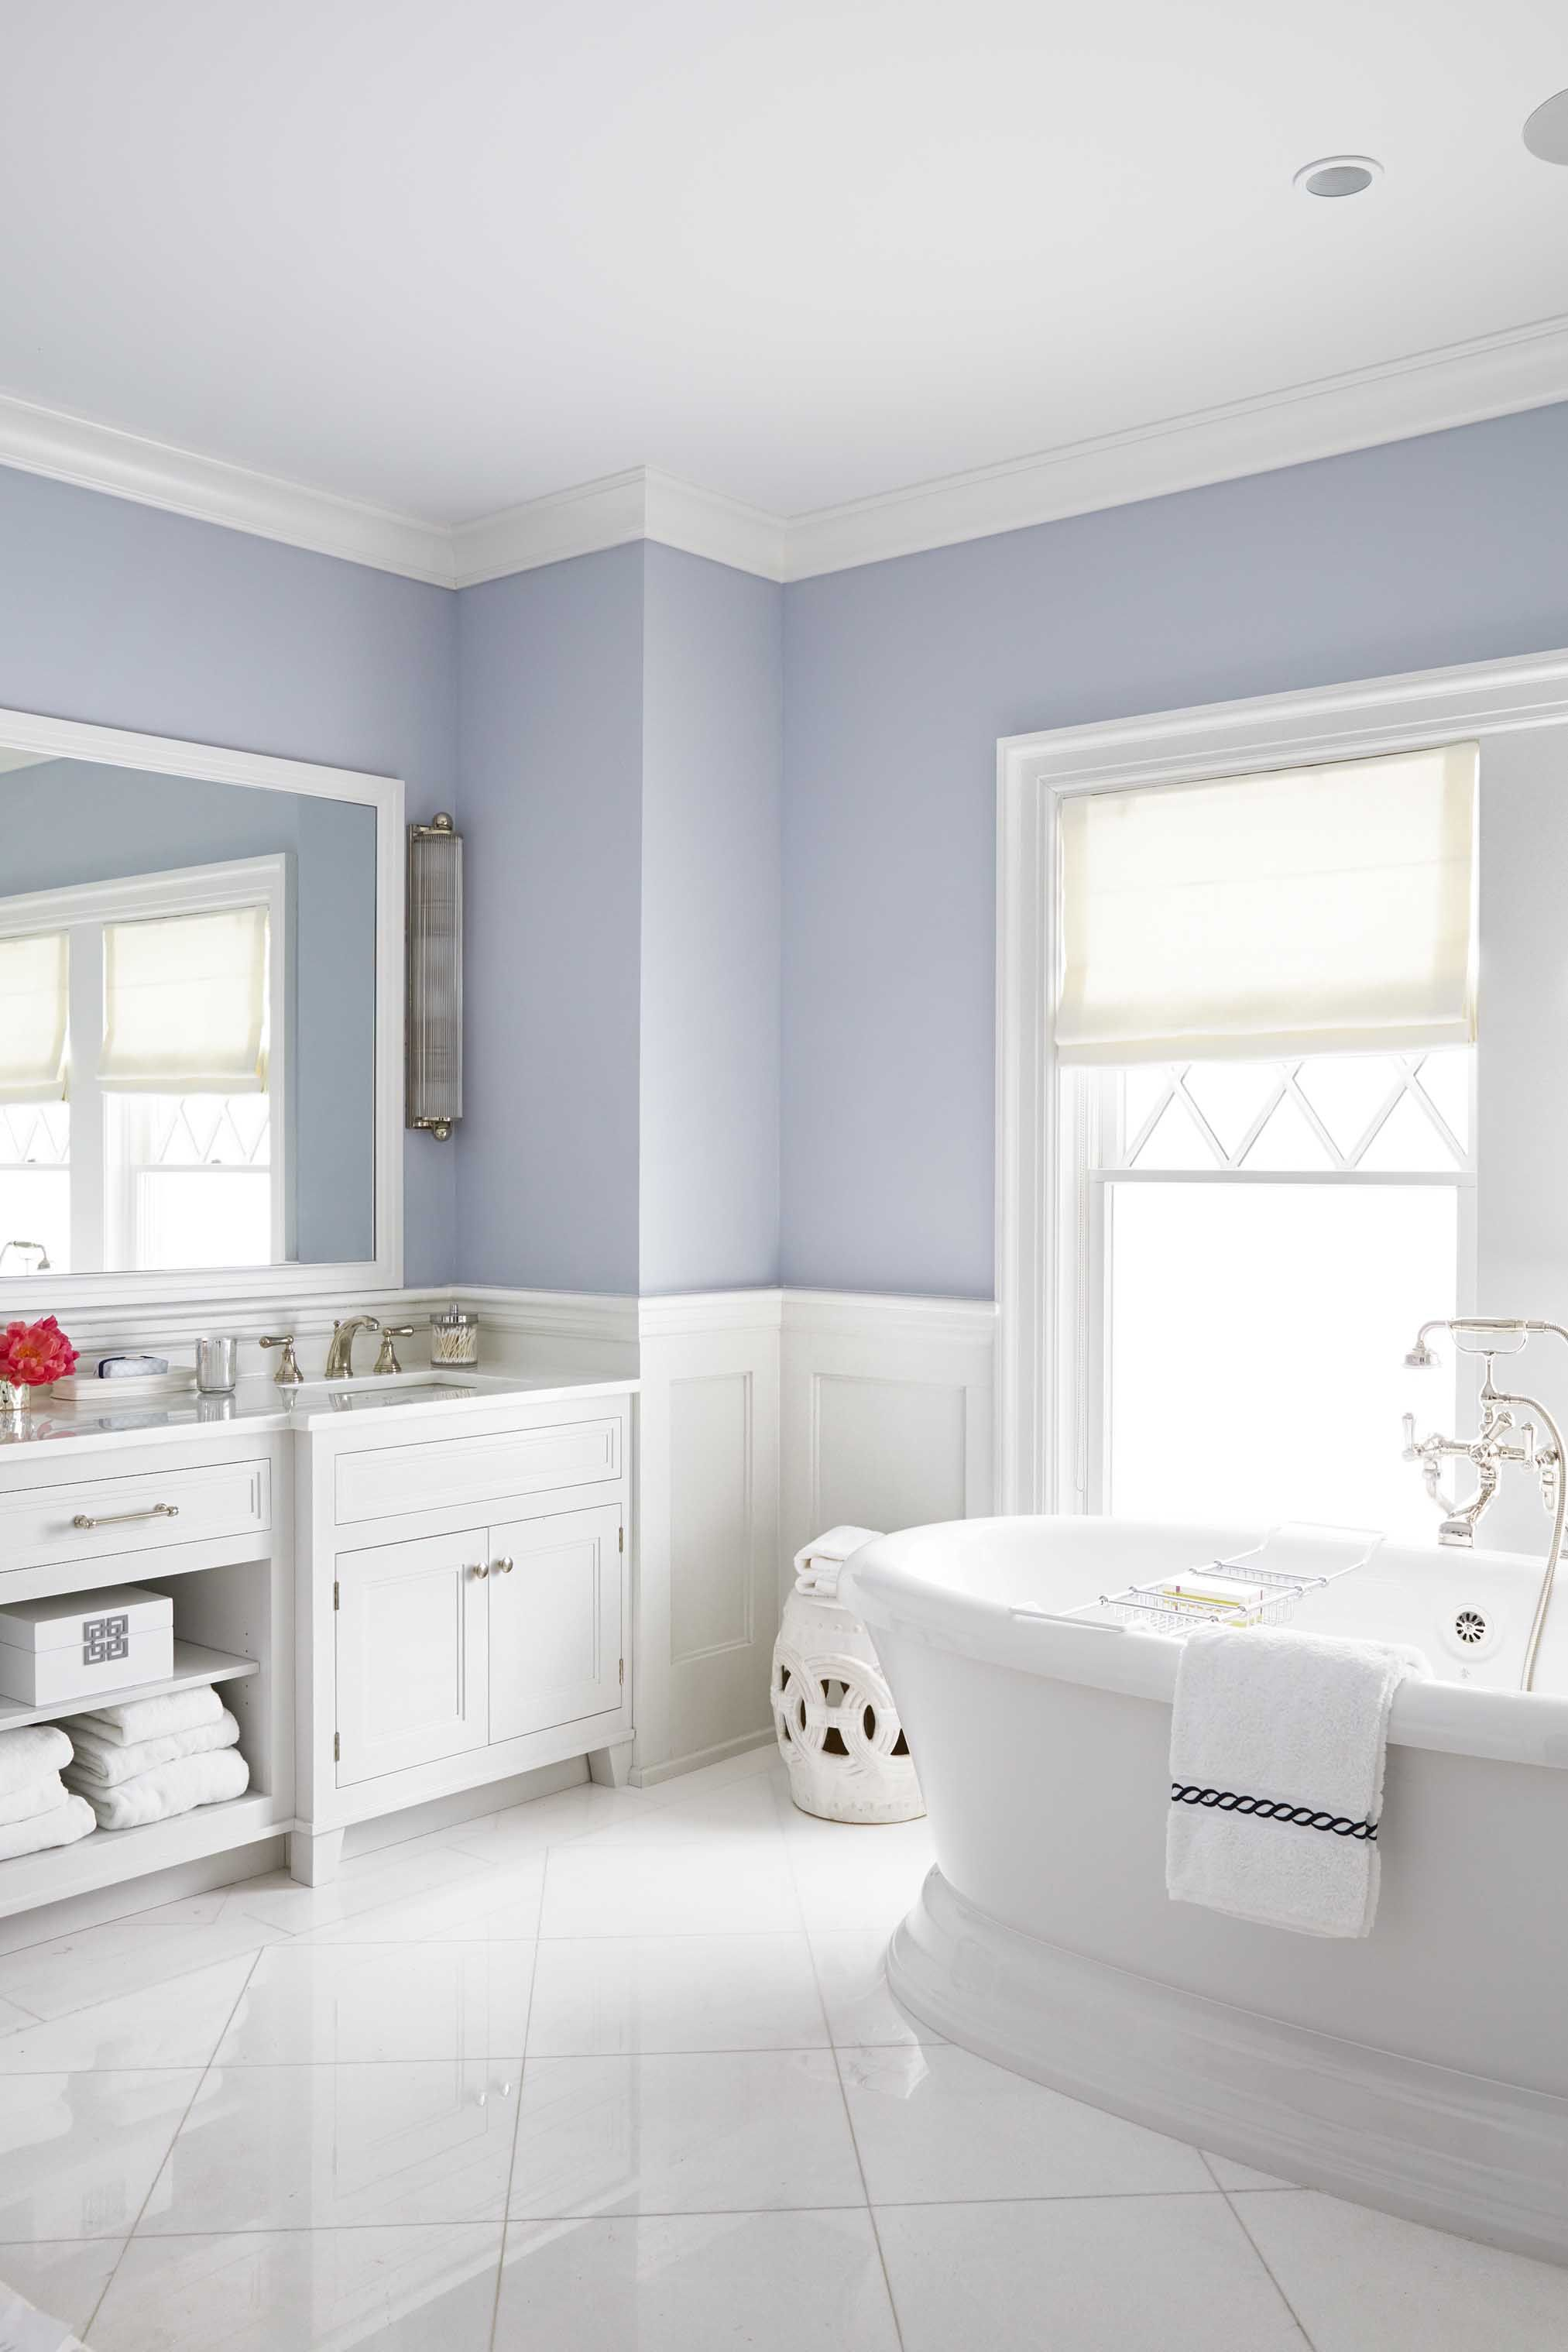 20 best bathroom paint colors popular ideas for bathroom wall colors rh goodhousekeeping com bathroom color schemes 2019 bathroom color schemes gray